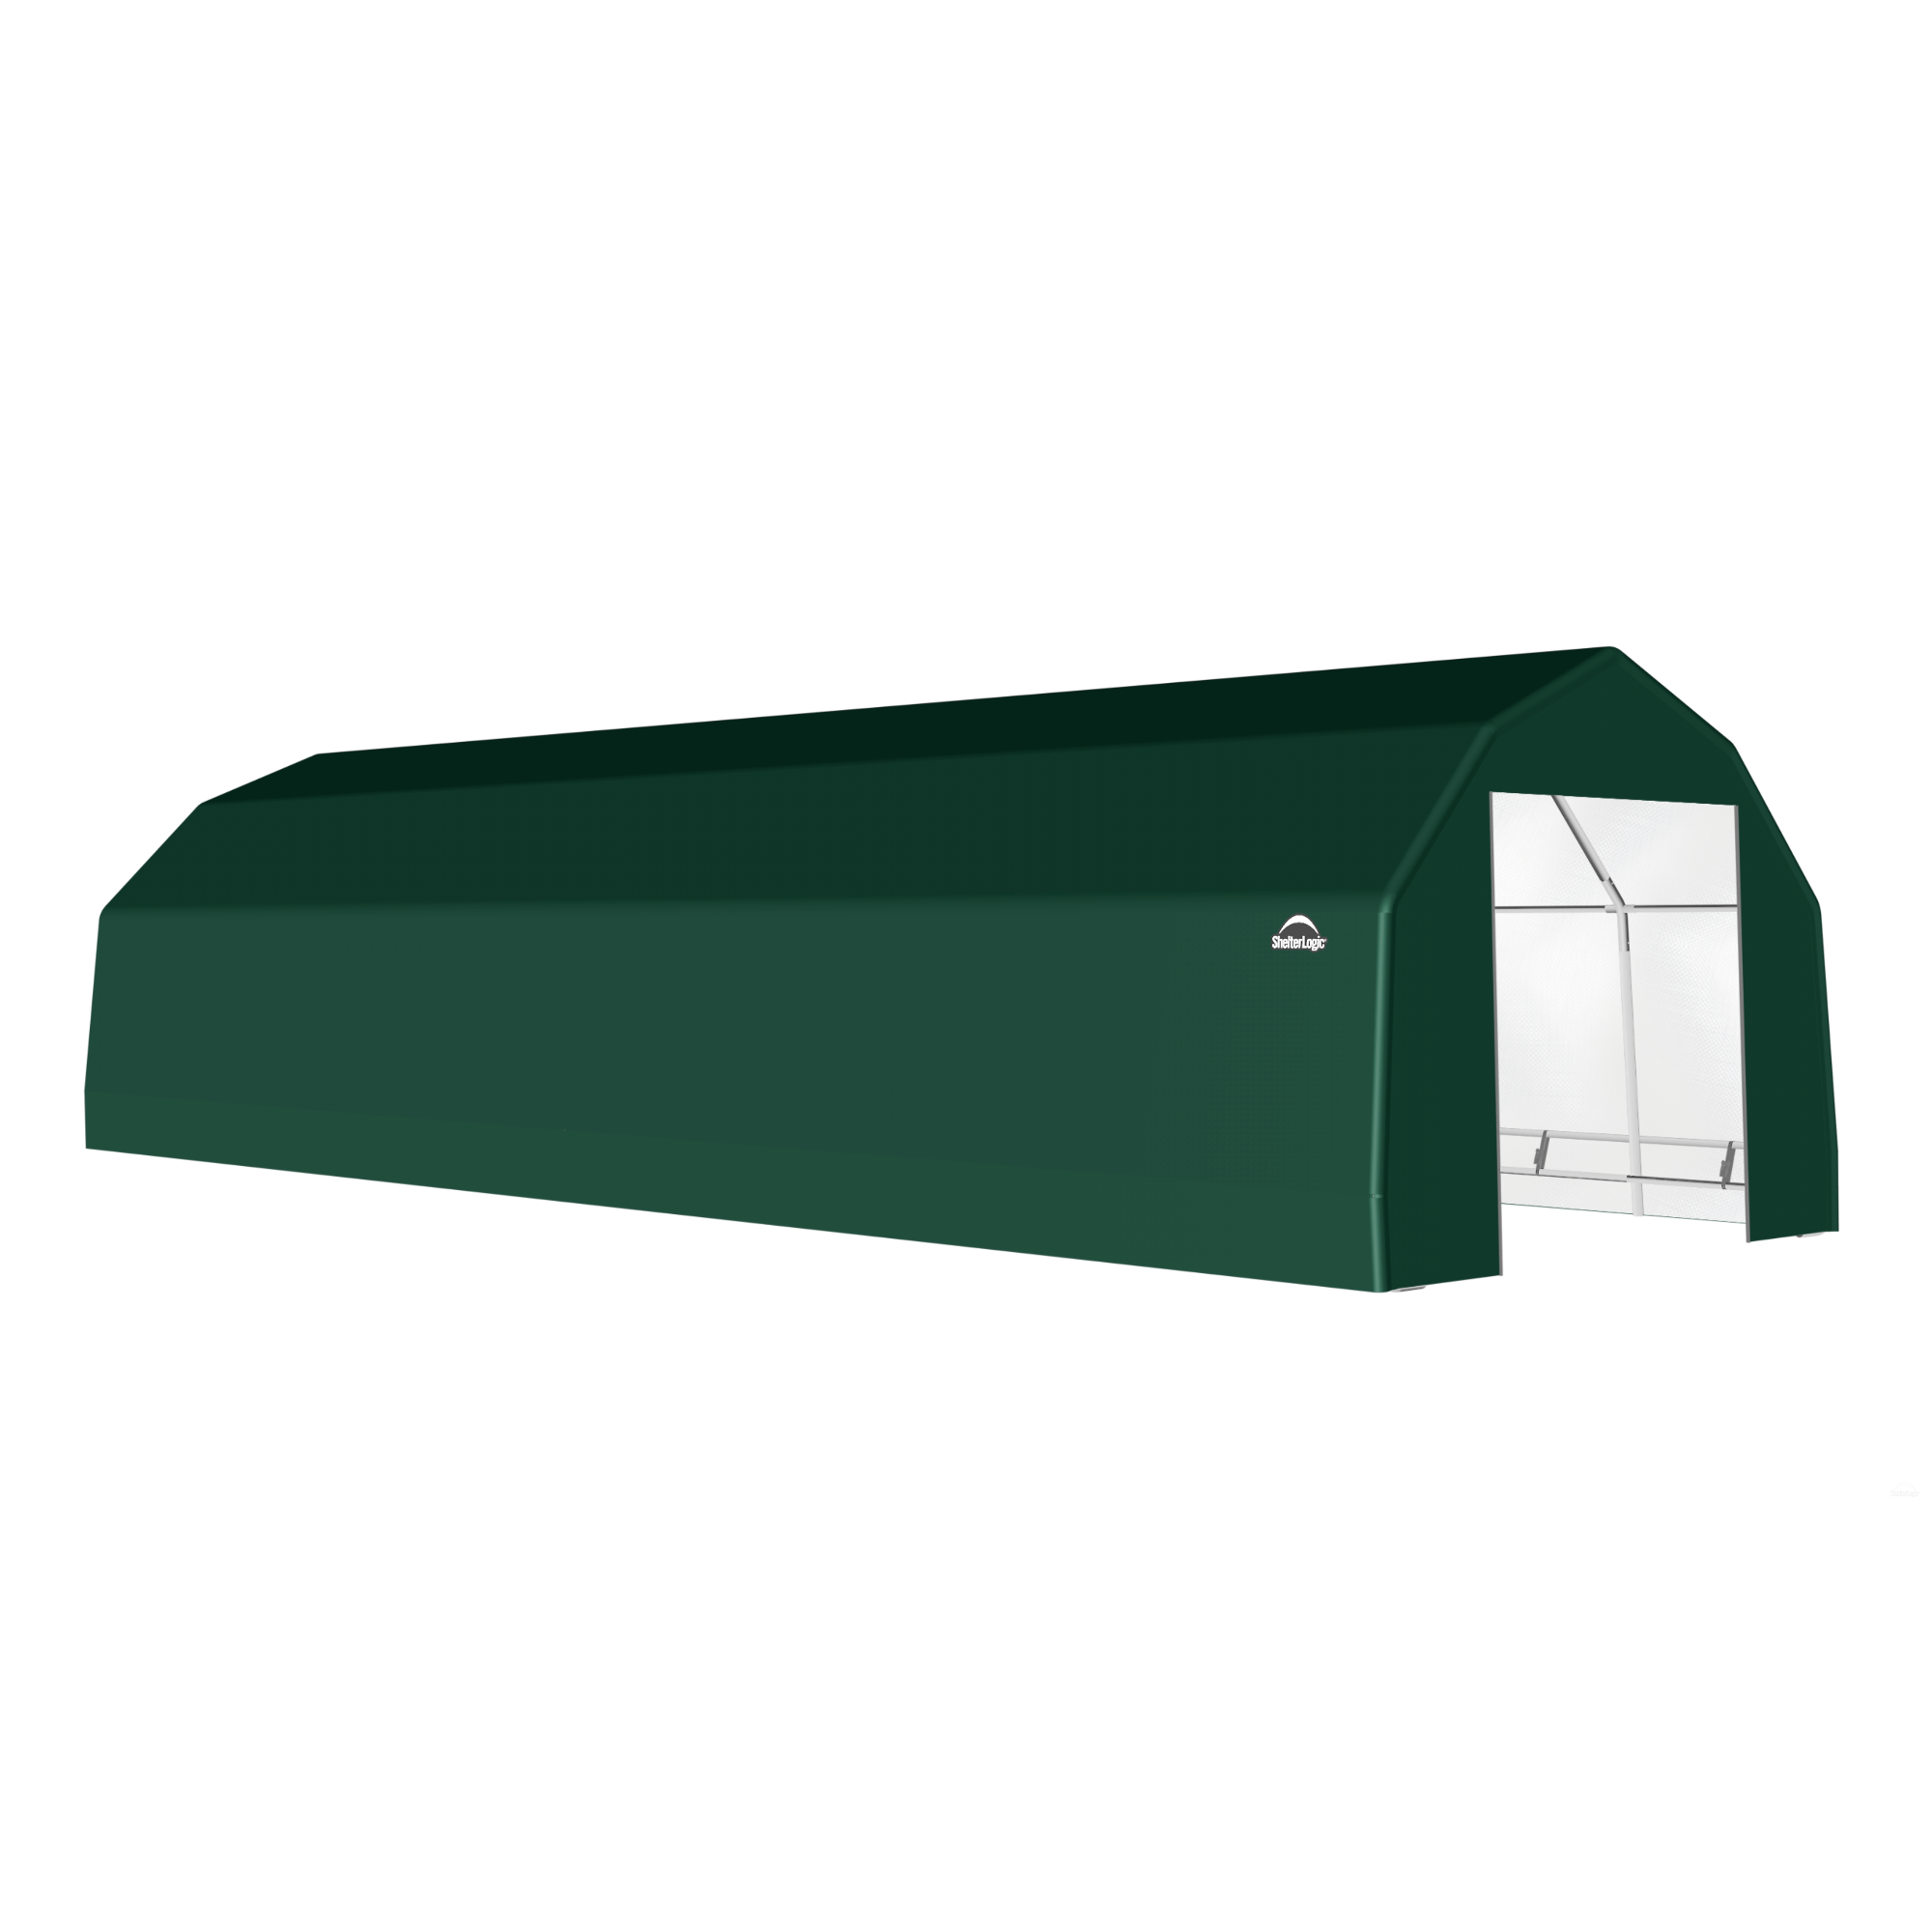 SP Barn 15X48X11 Green 14 oz PE Shelter